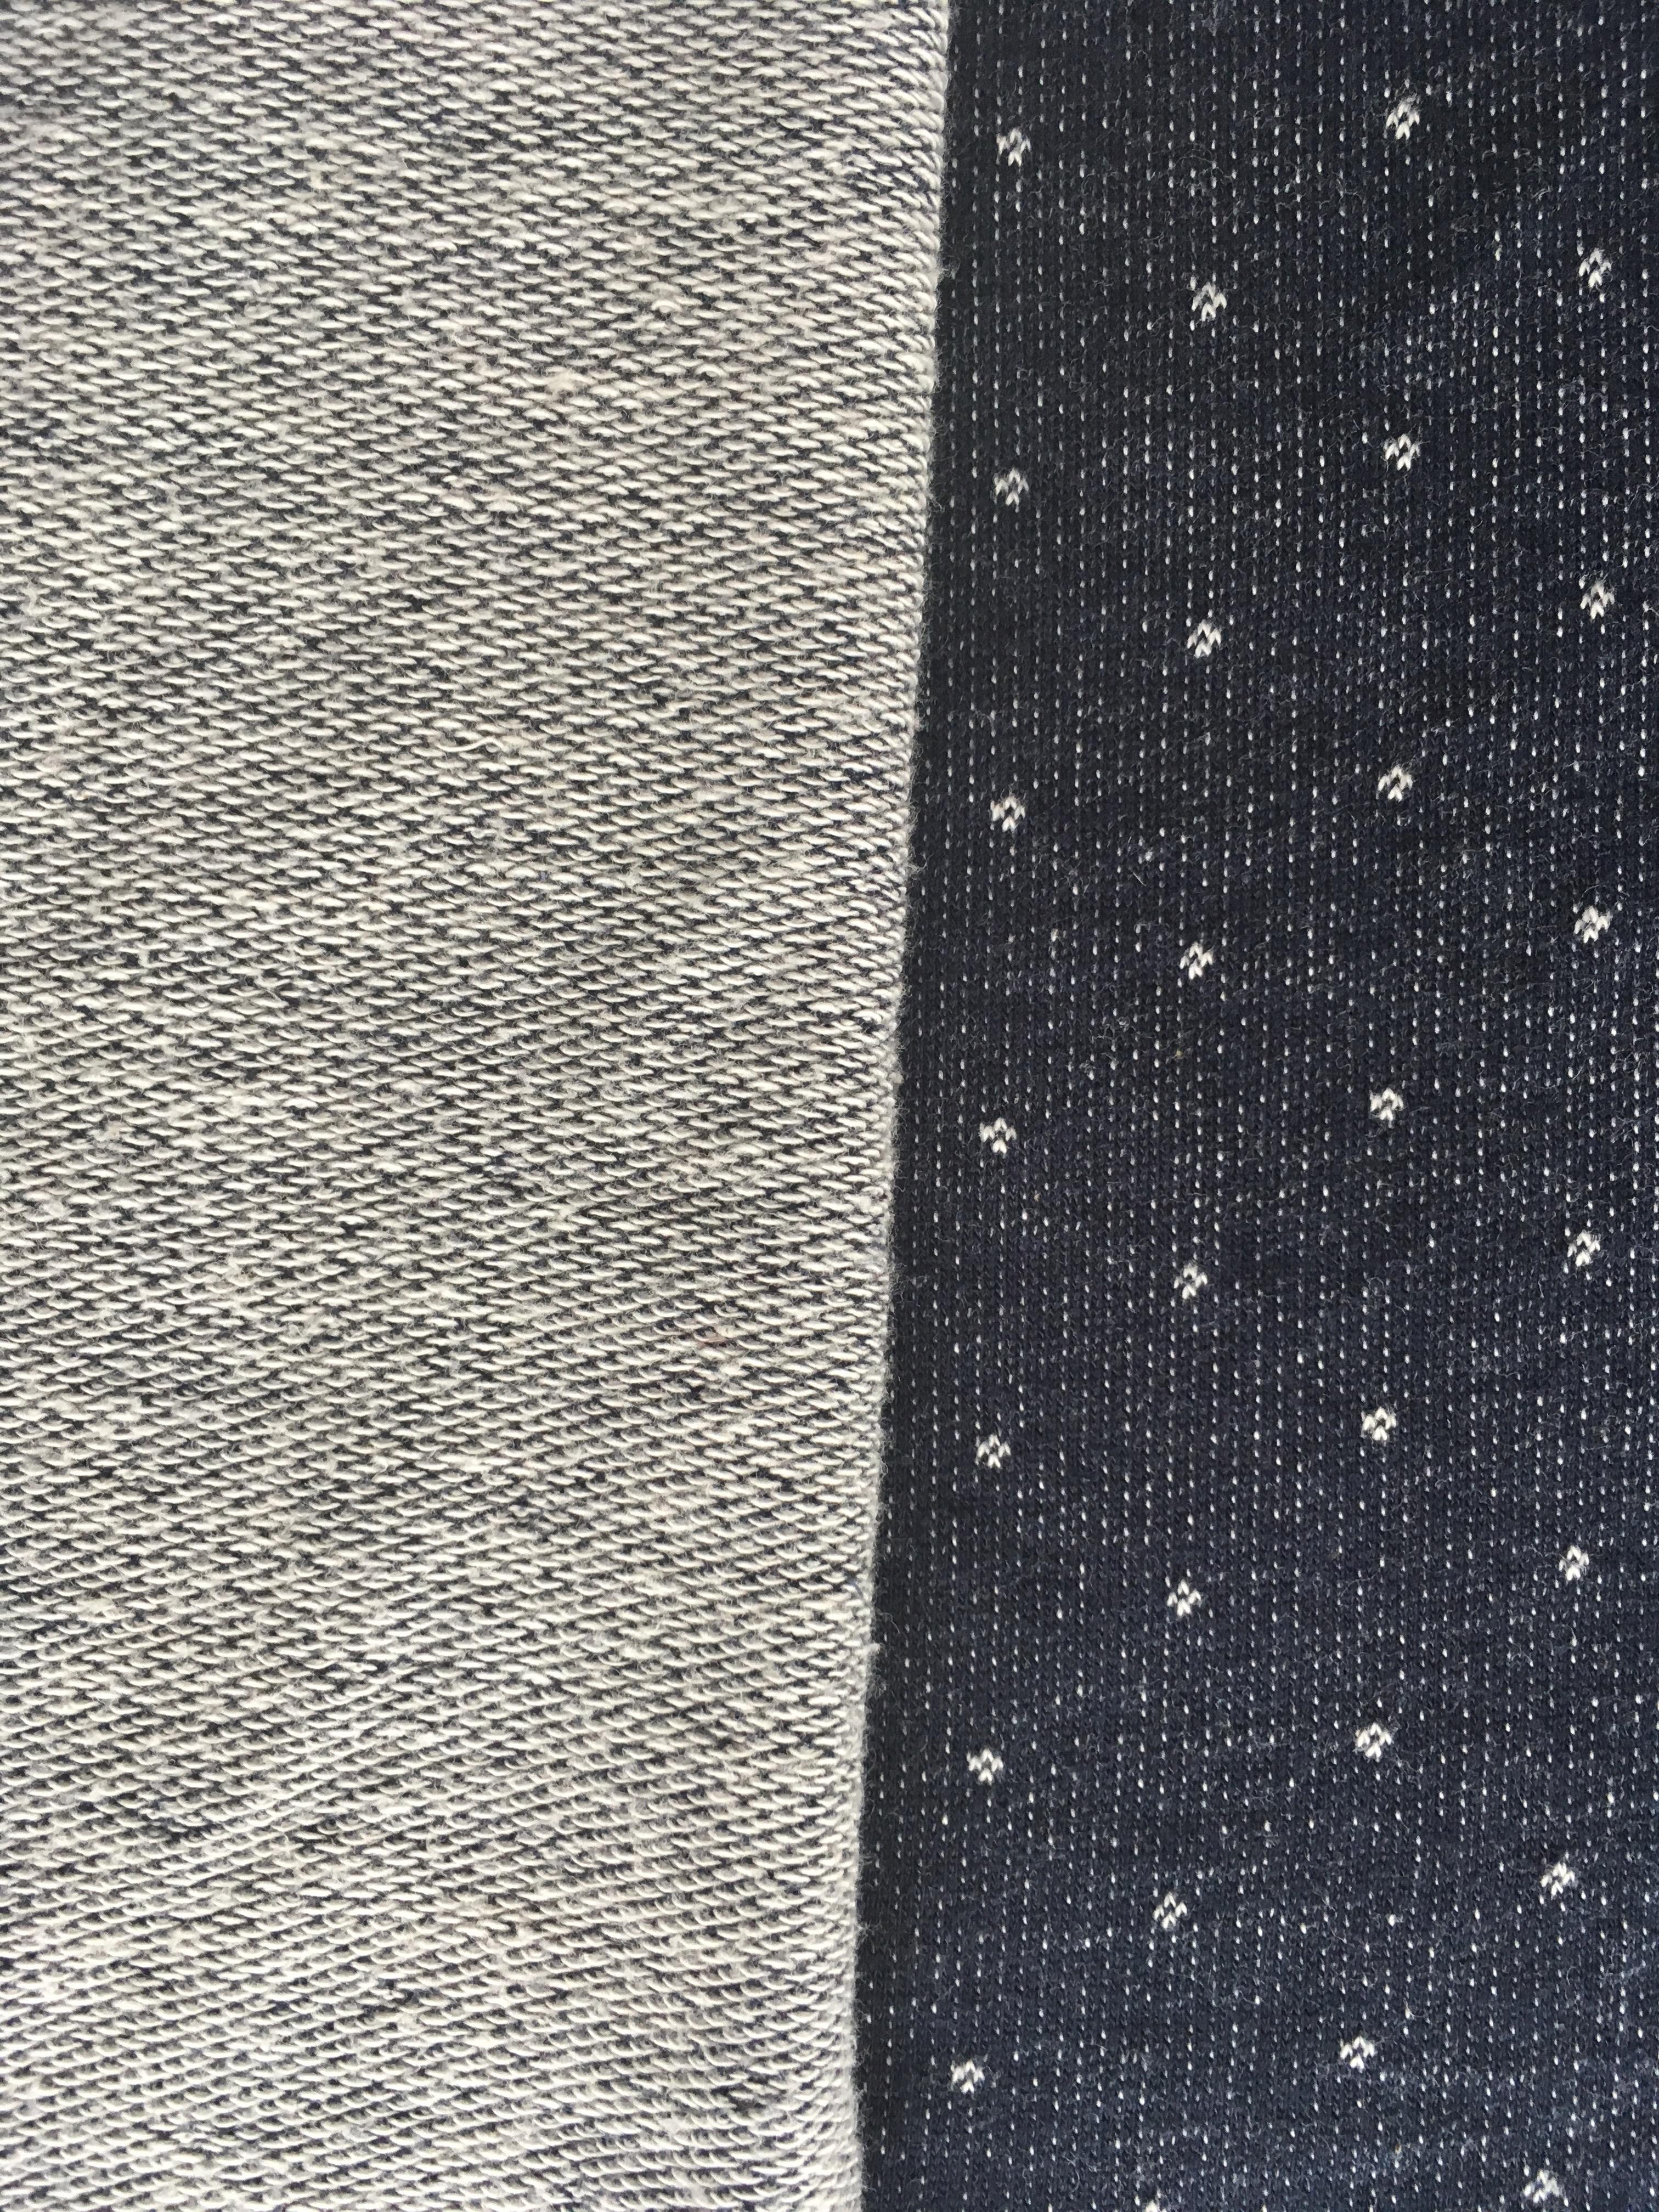 Seamstress needs help choosing sewing challenge fabric